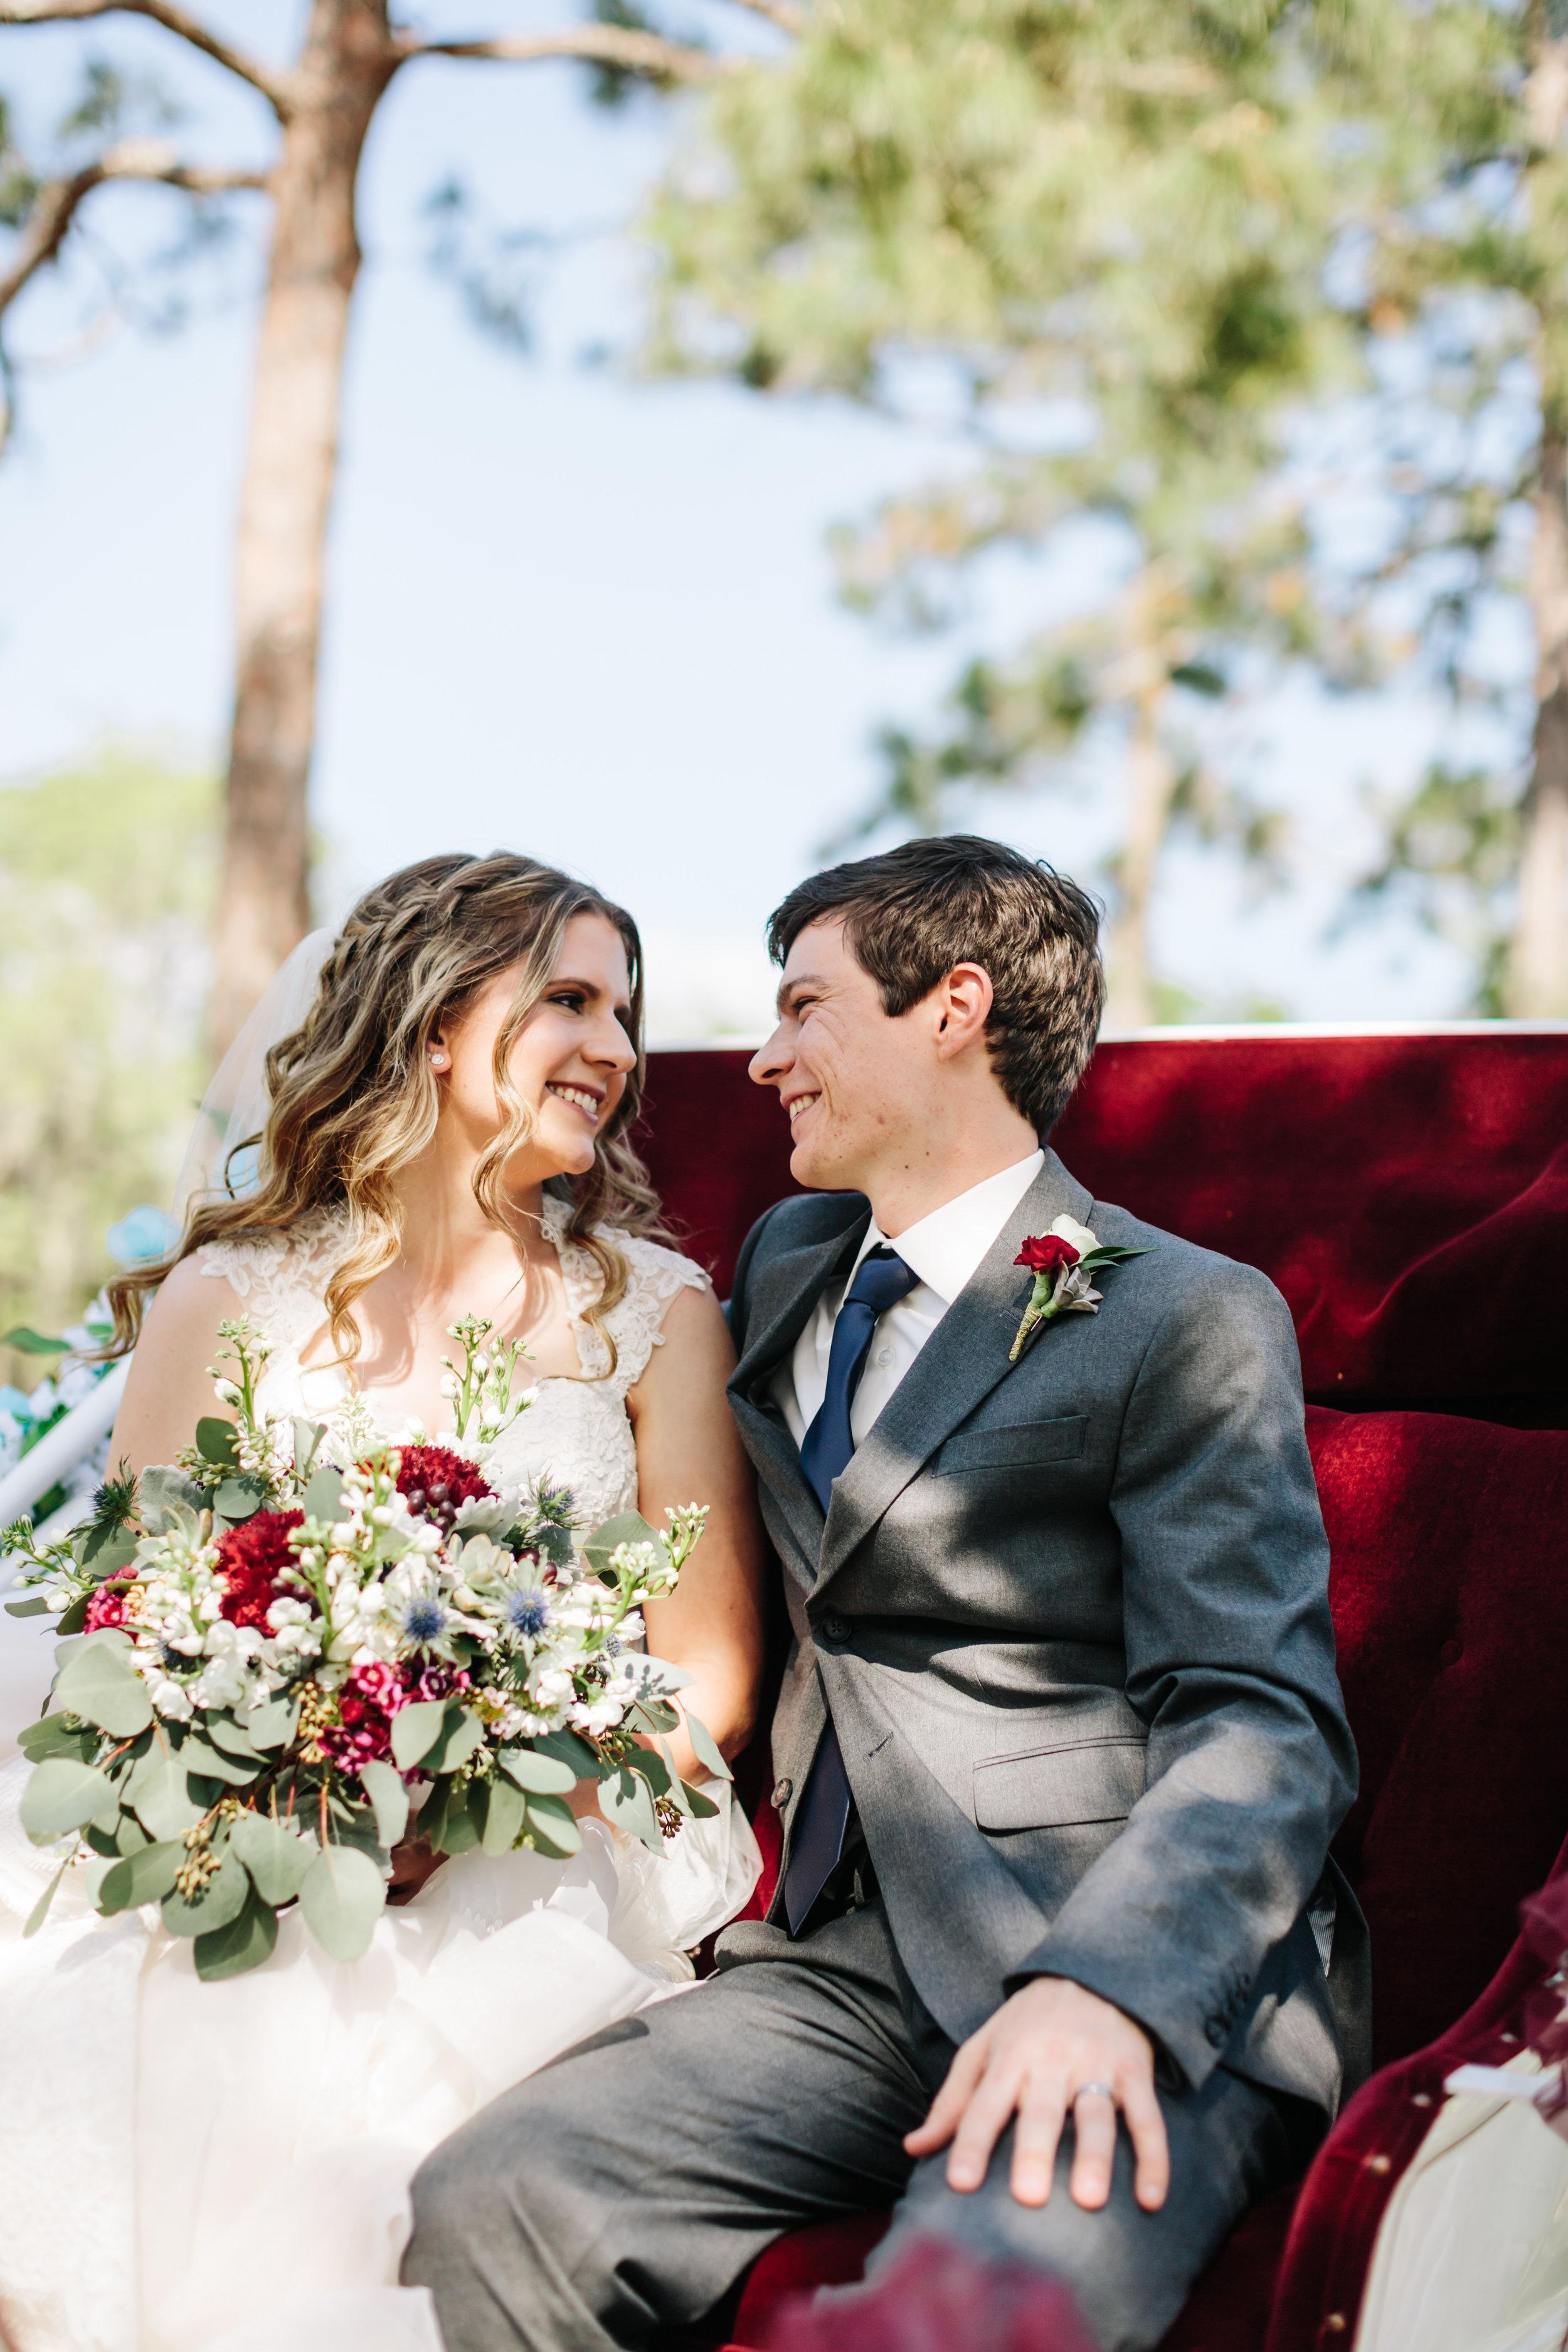 2018.04.14 Zak and Jamisyn Unrue Black Willow Barn Wedding Finals-432.jpg